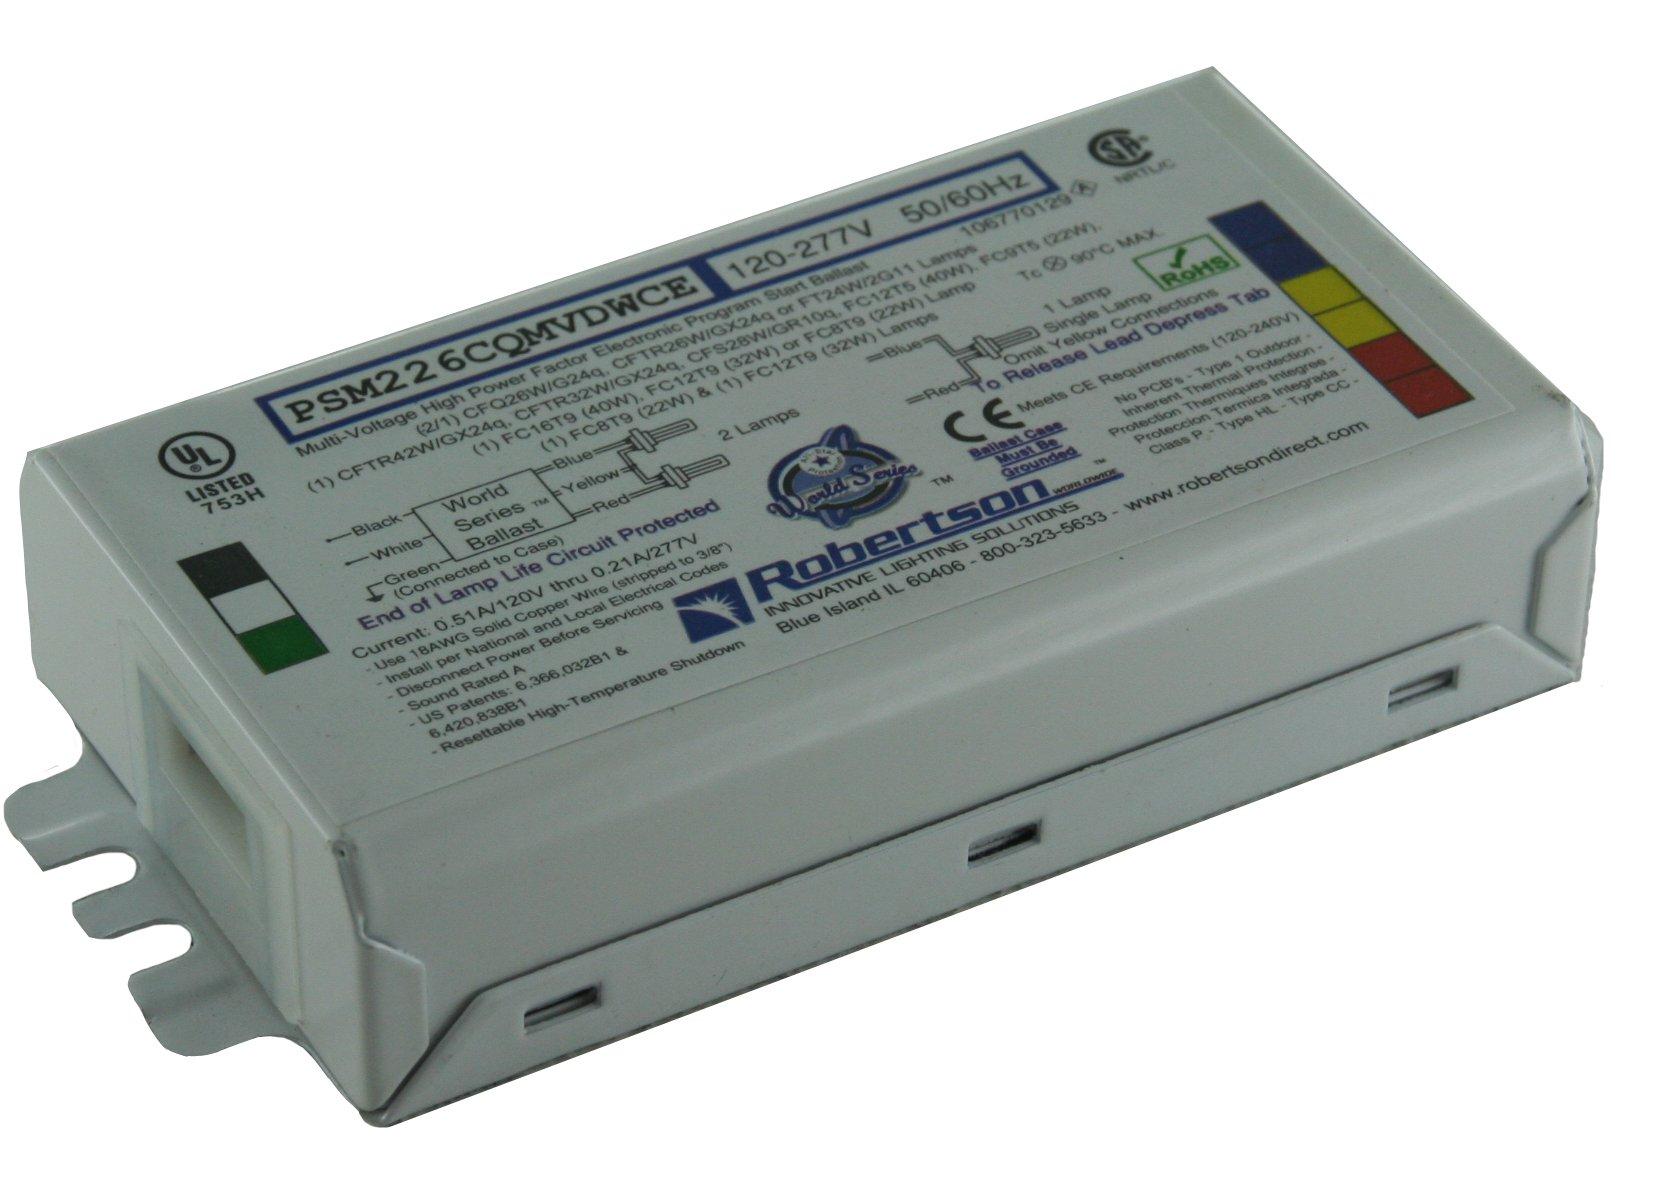 ROBERTSON 3P20145 Individual Fluorescent eBallast, 2 CFQ26W/G24q CFL Lamp, Program Start, 120-277Vac, 50-60Hz, Normal Ballast Factor, HPF, Model PSM226CQMVDWCEST (Replaces Model PSM226CQMVDWCE/S)